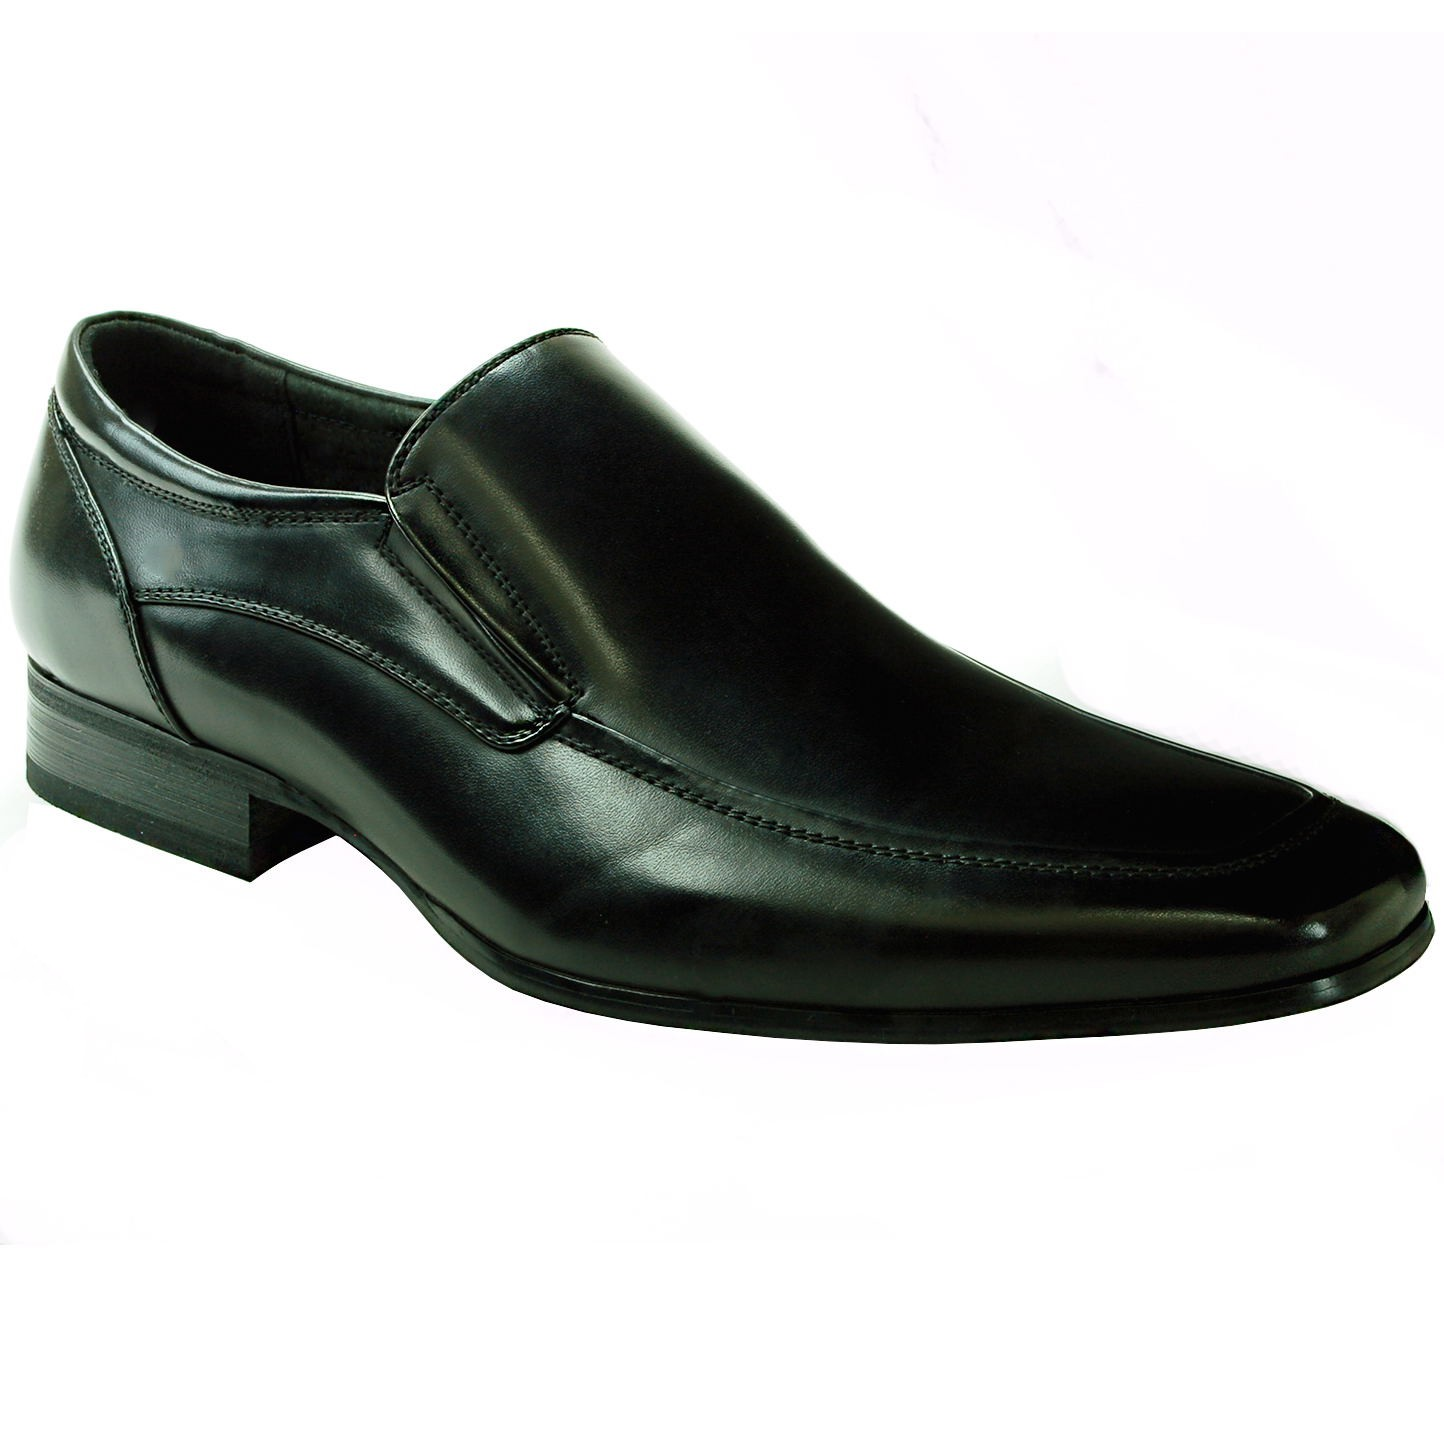 alpineswiss lucerne mens dress shoes slipon moc toe